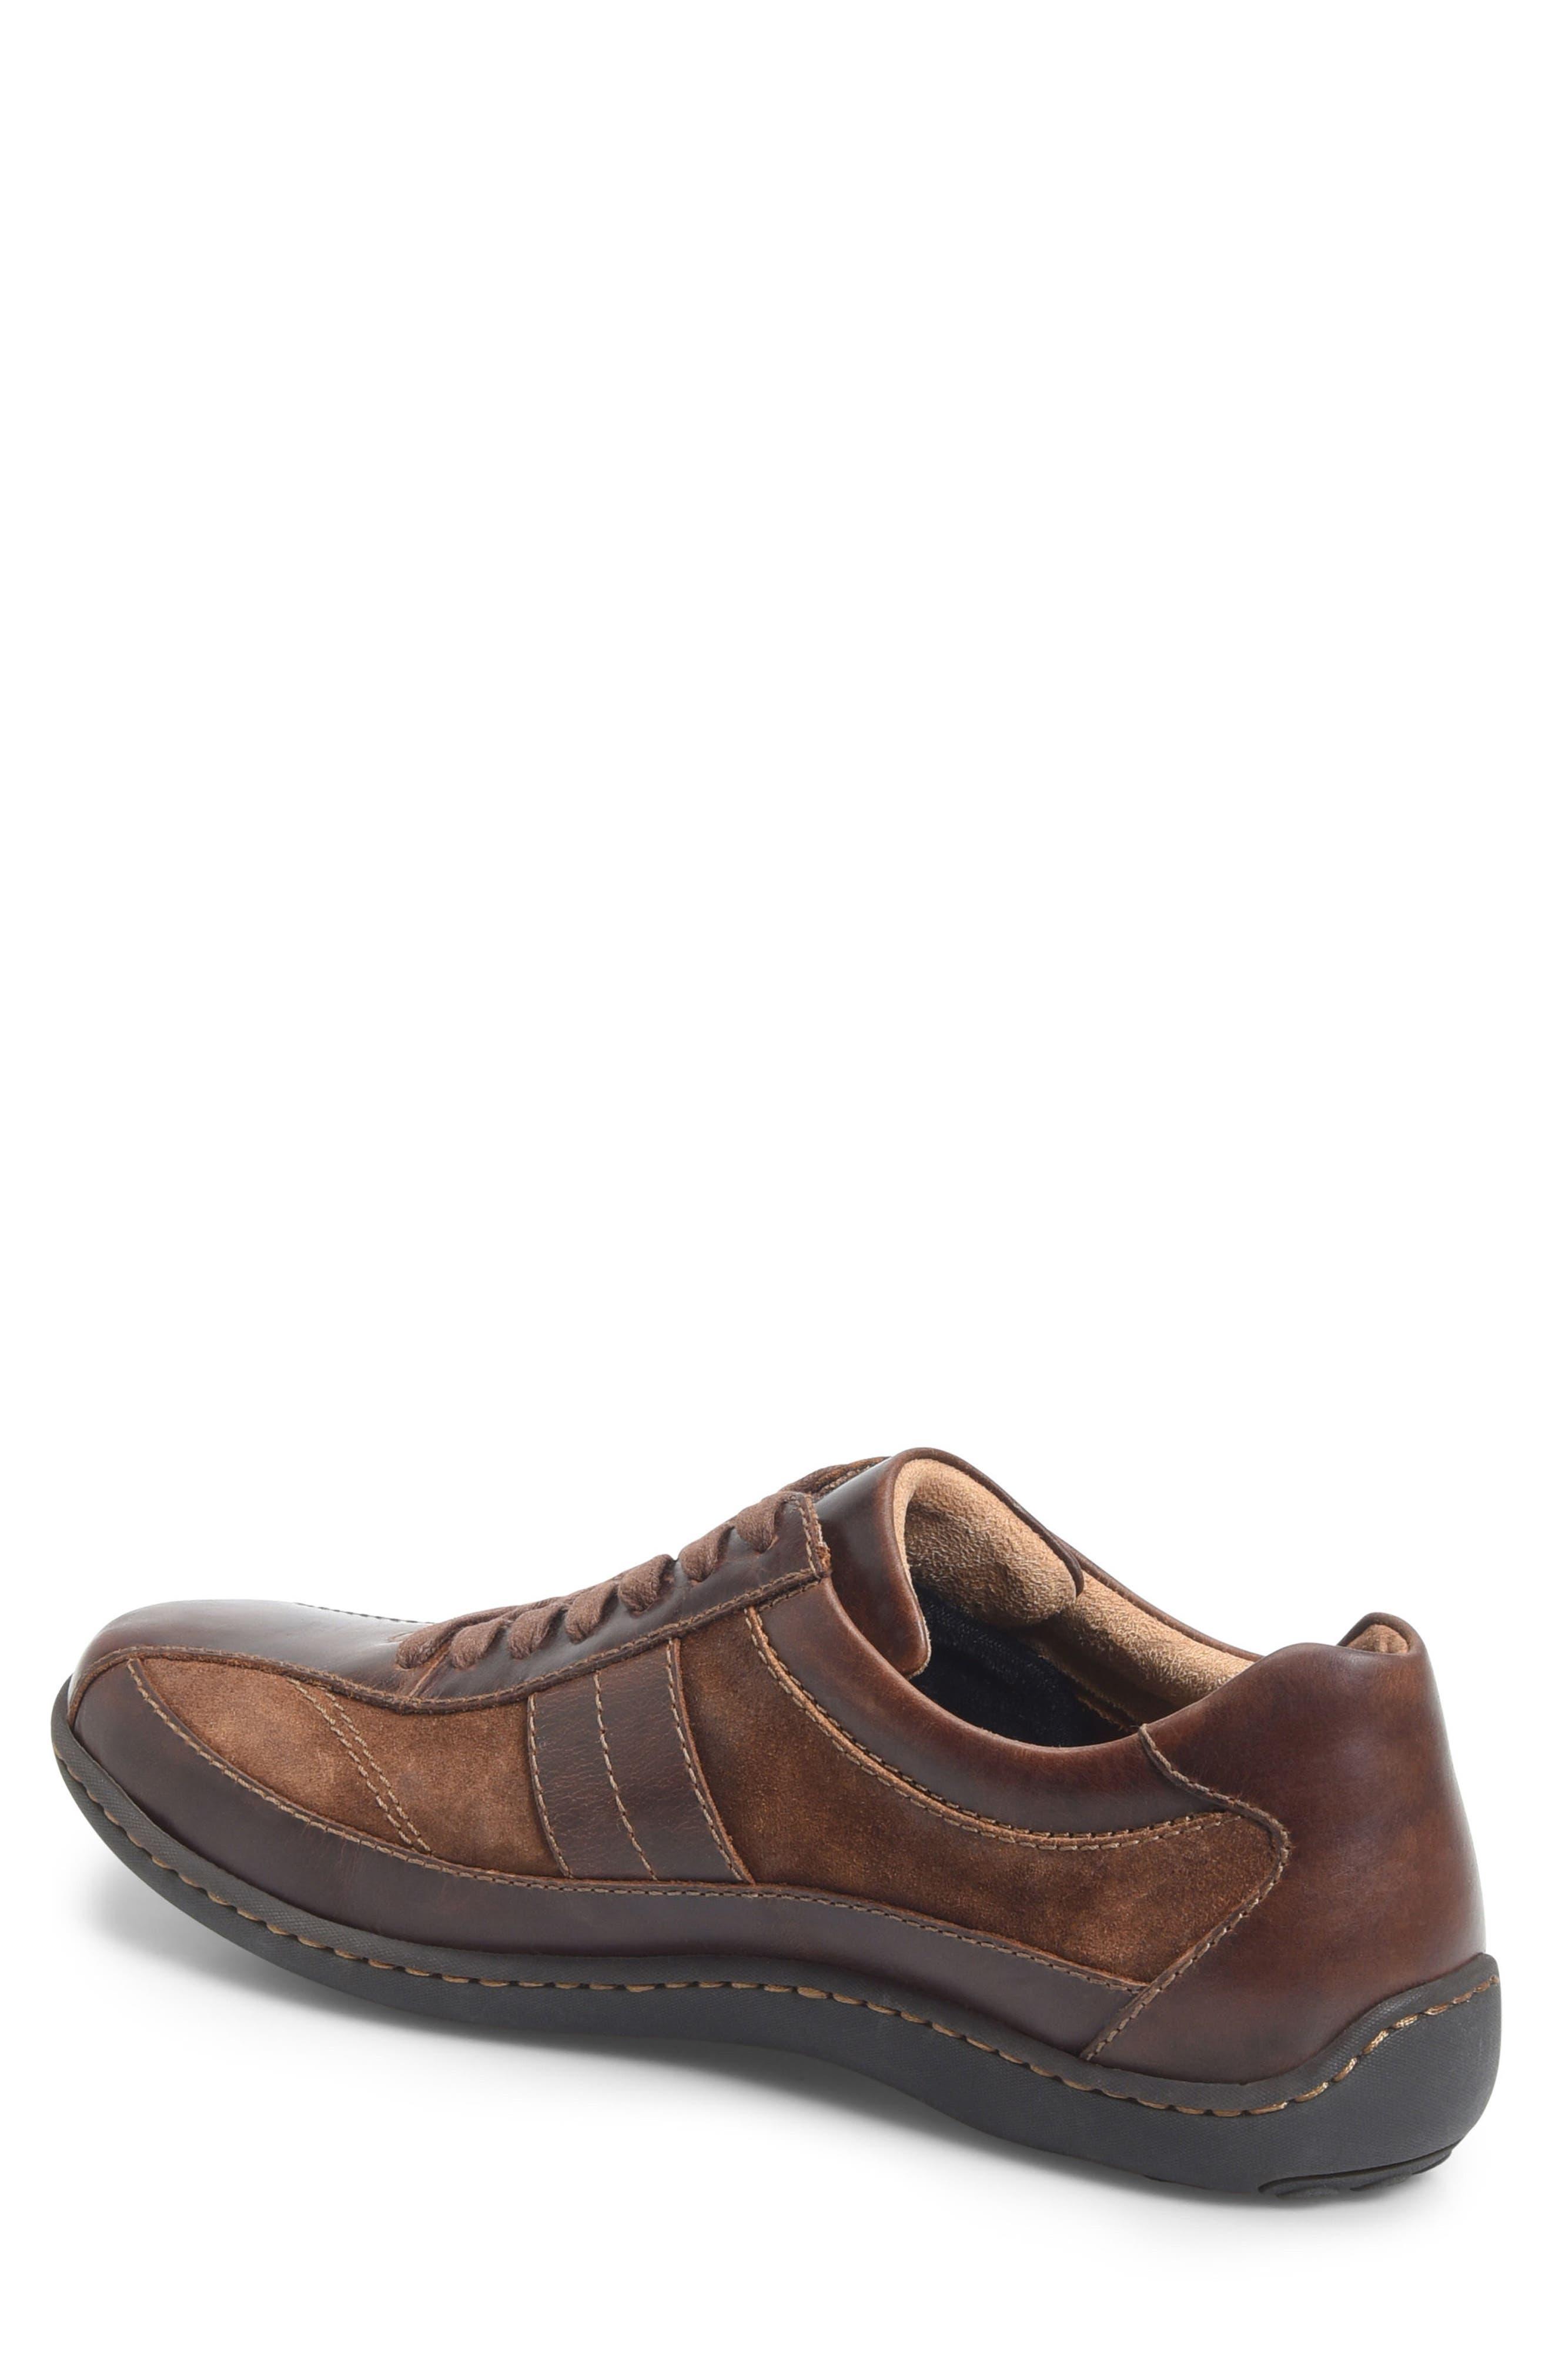 BØRN,                             Breves Low Top Sneaker,                             Alternate thumbnail 2, color,                             230